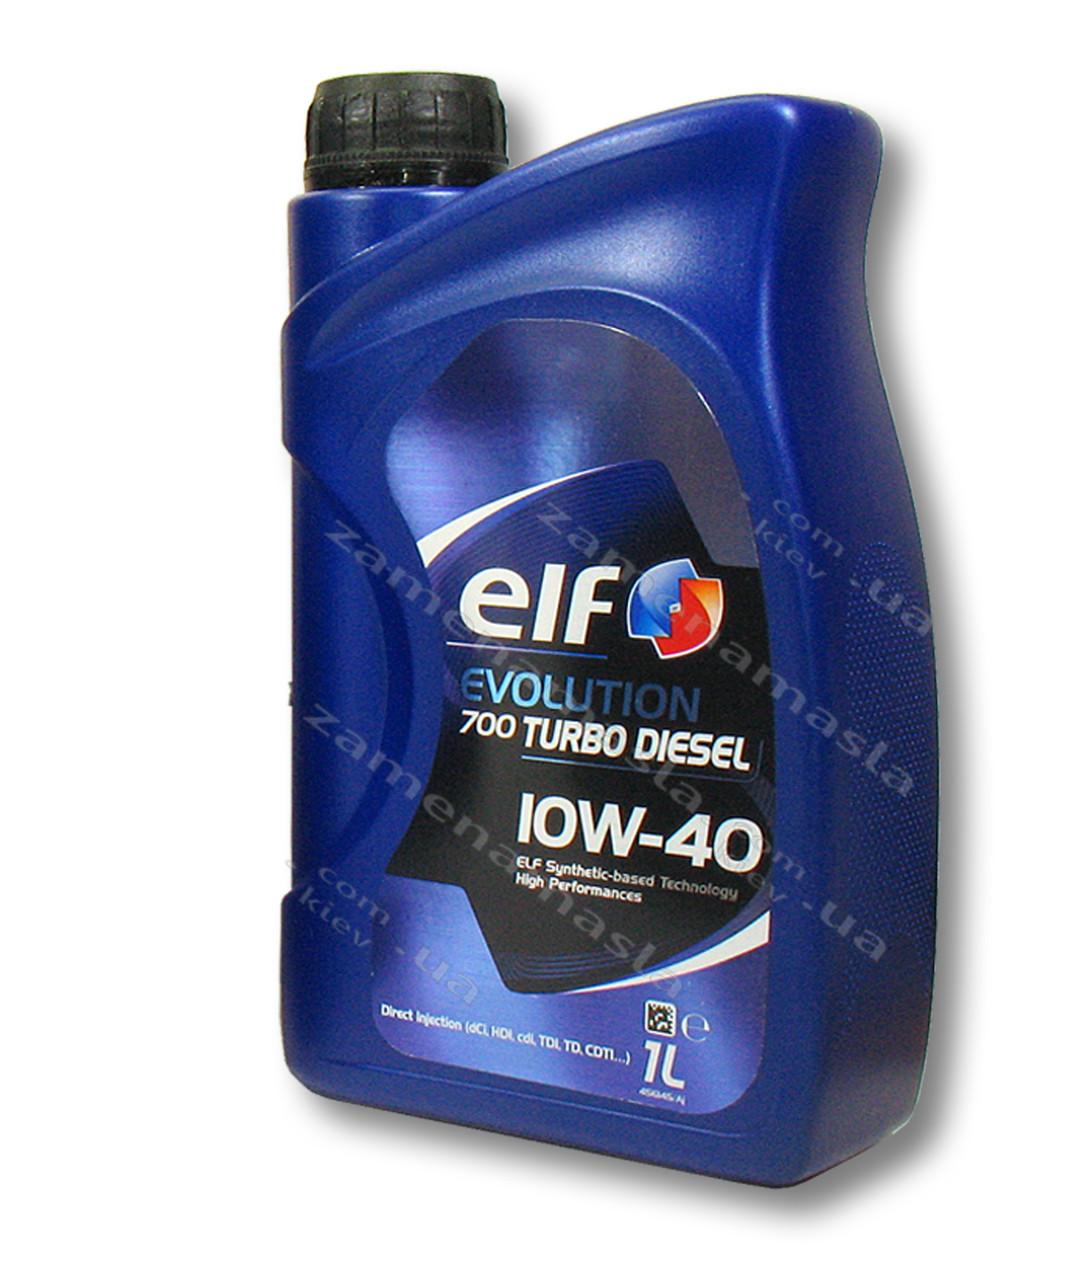 Elf Evolution 700 turbo diesel 10W40 1л - моторное масло